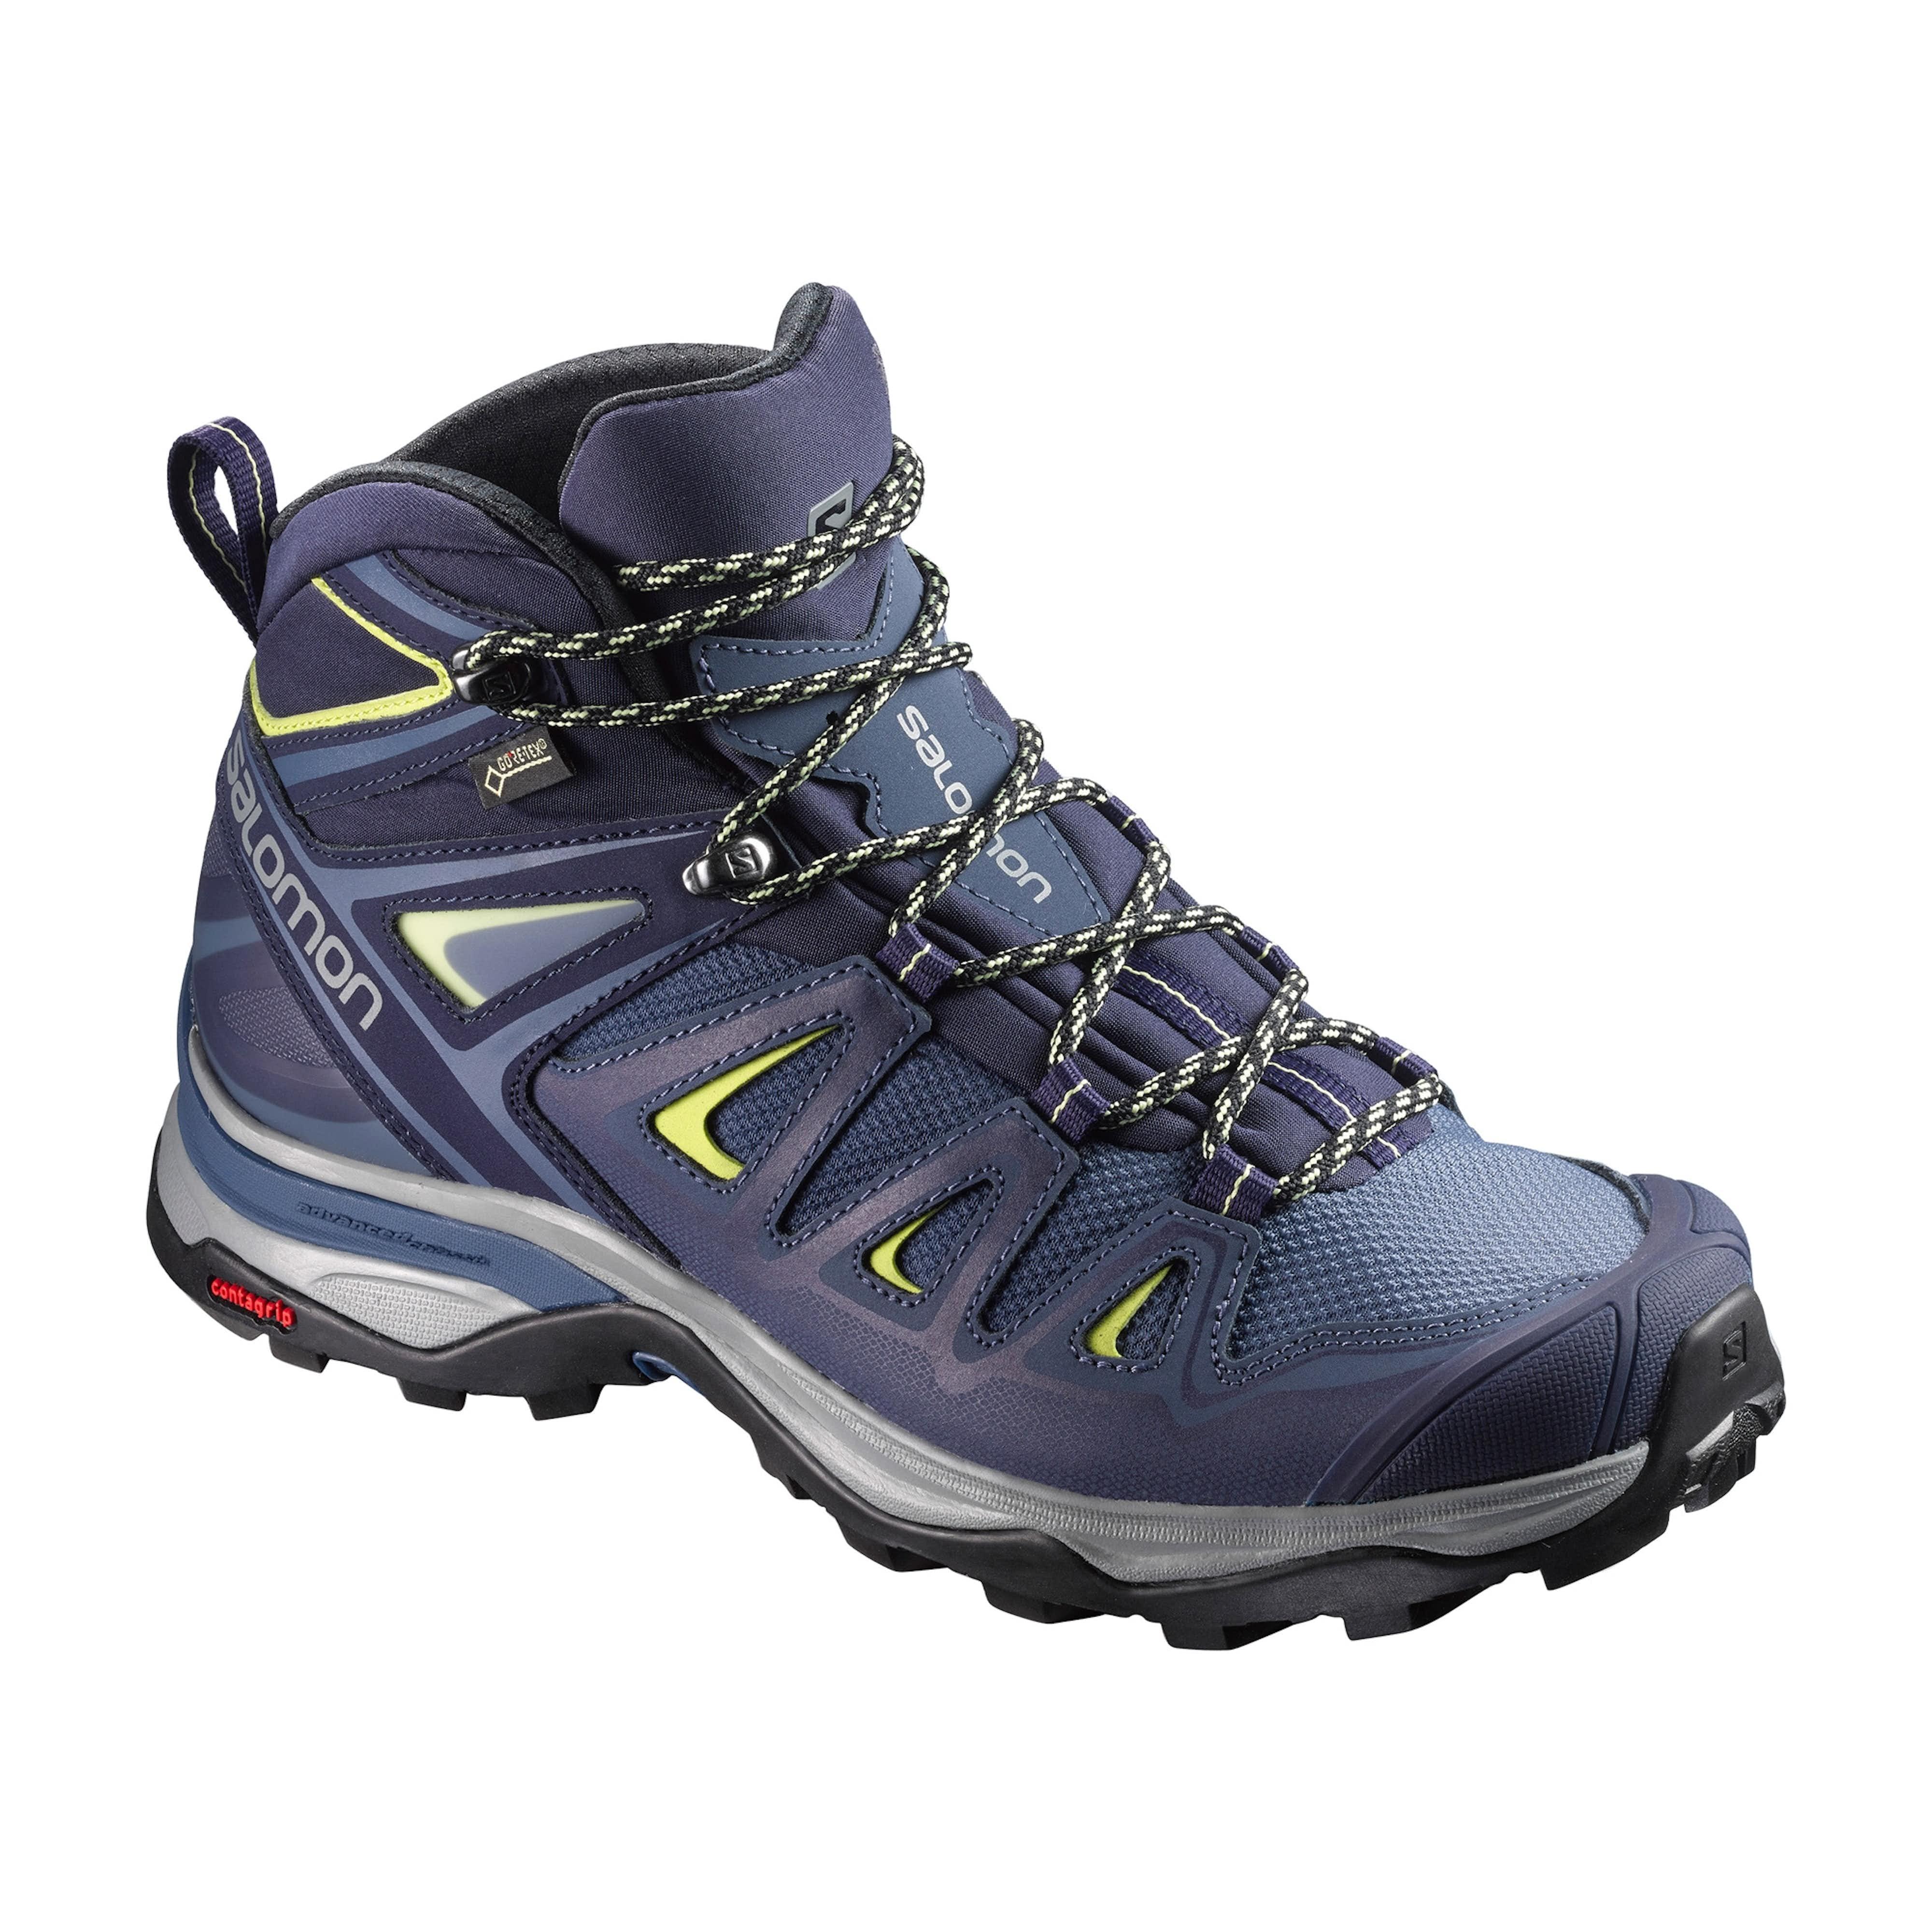 Salomon X Ultra 3 Mid GORE-TEX Women s Boots bd9c2605b9e